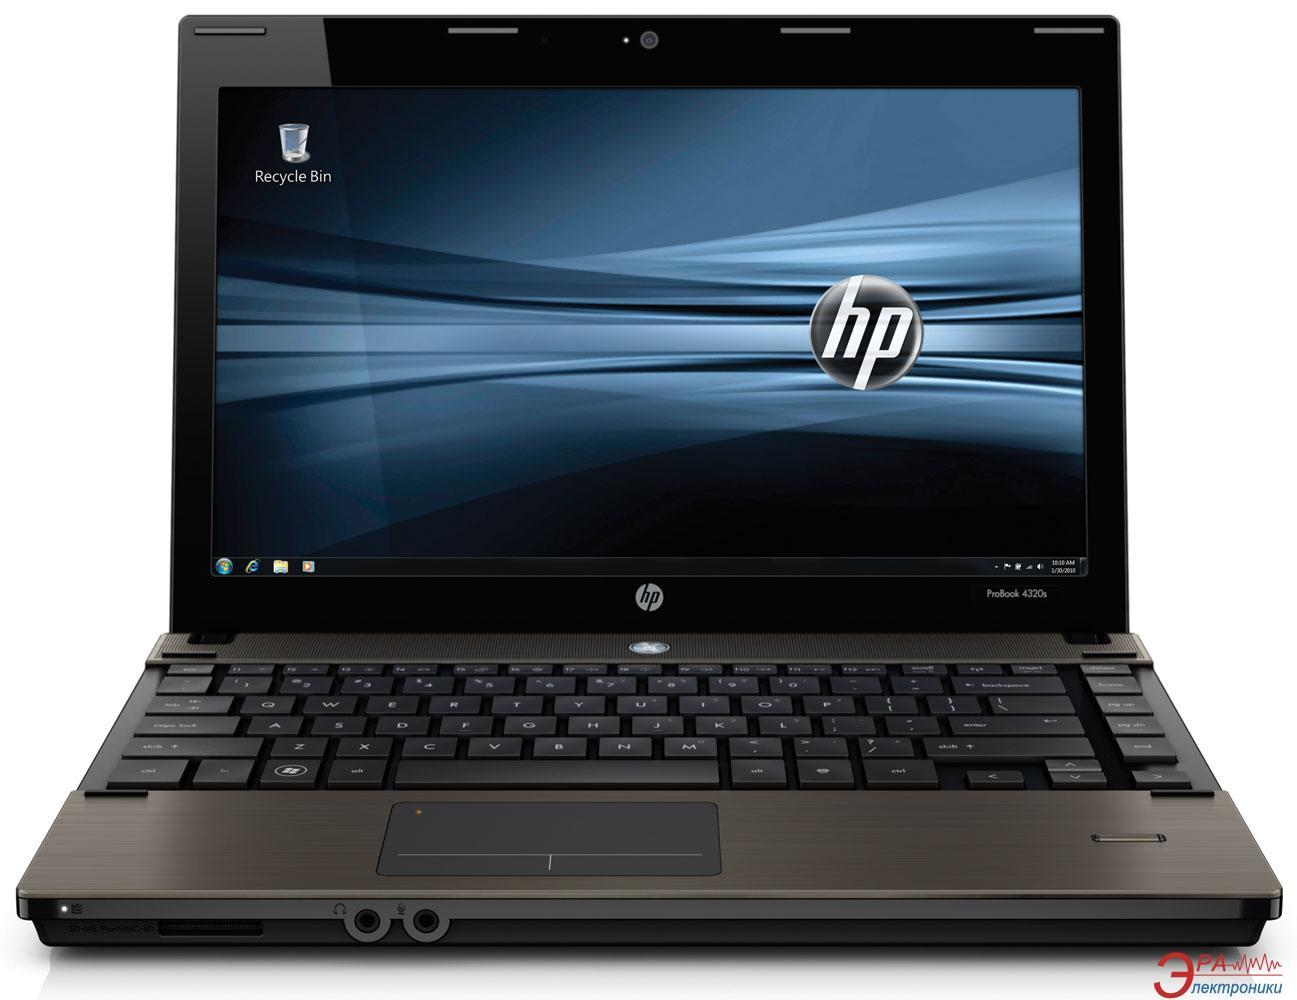 Ноутбук HP ProBook 4520s (WT127EA) Black 15,6